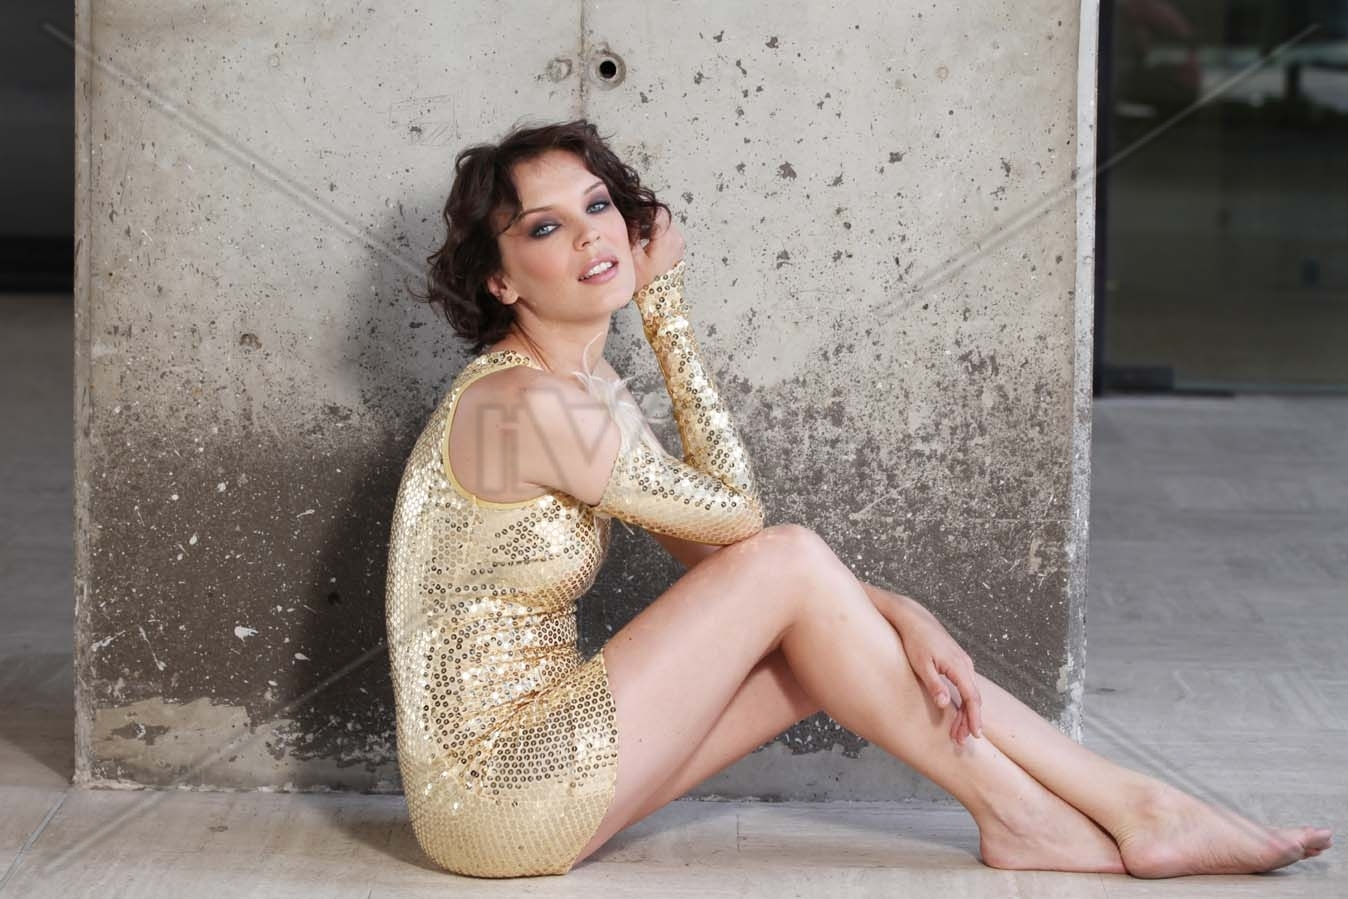 Andrea Lehotska's Feet Natalie Portman Imdb